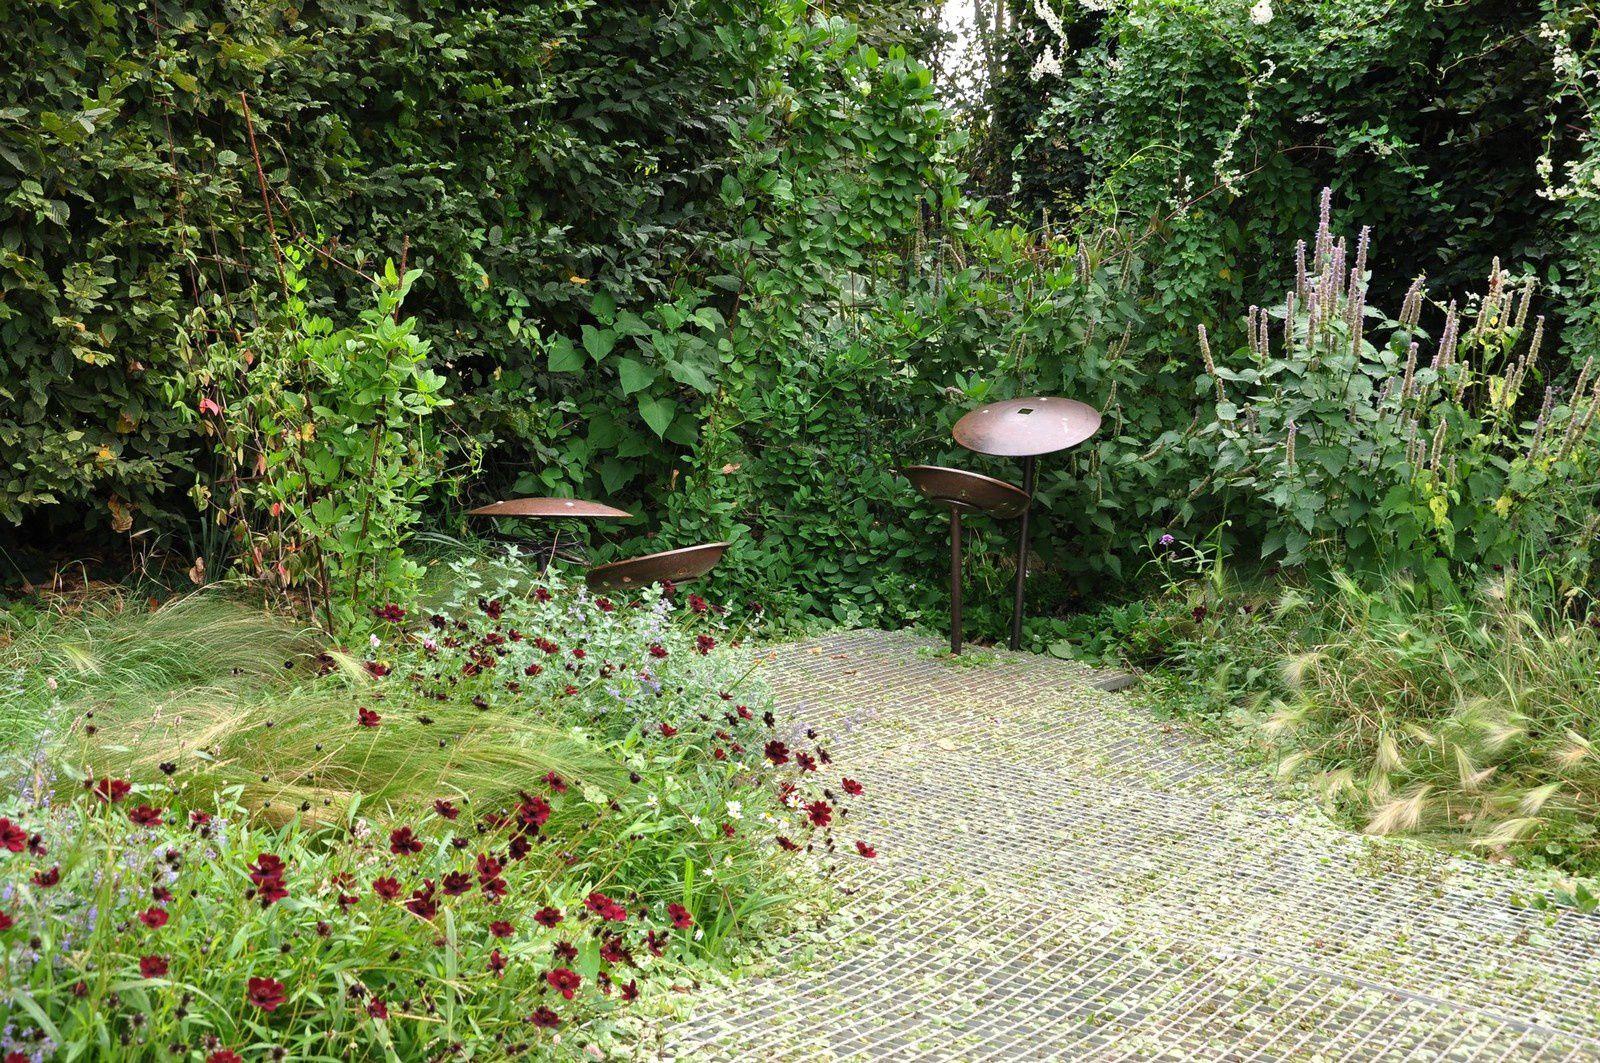 Jardin n°24 : Puissantes immobiles